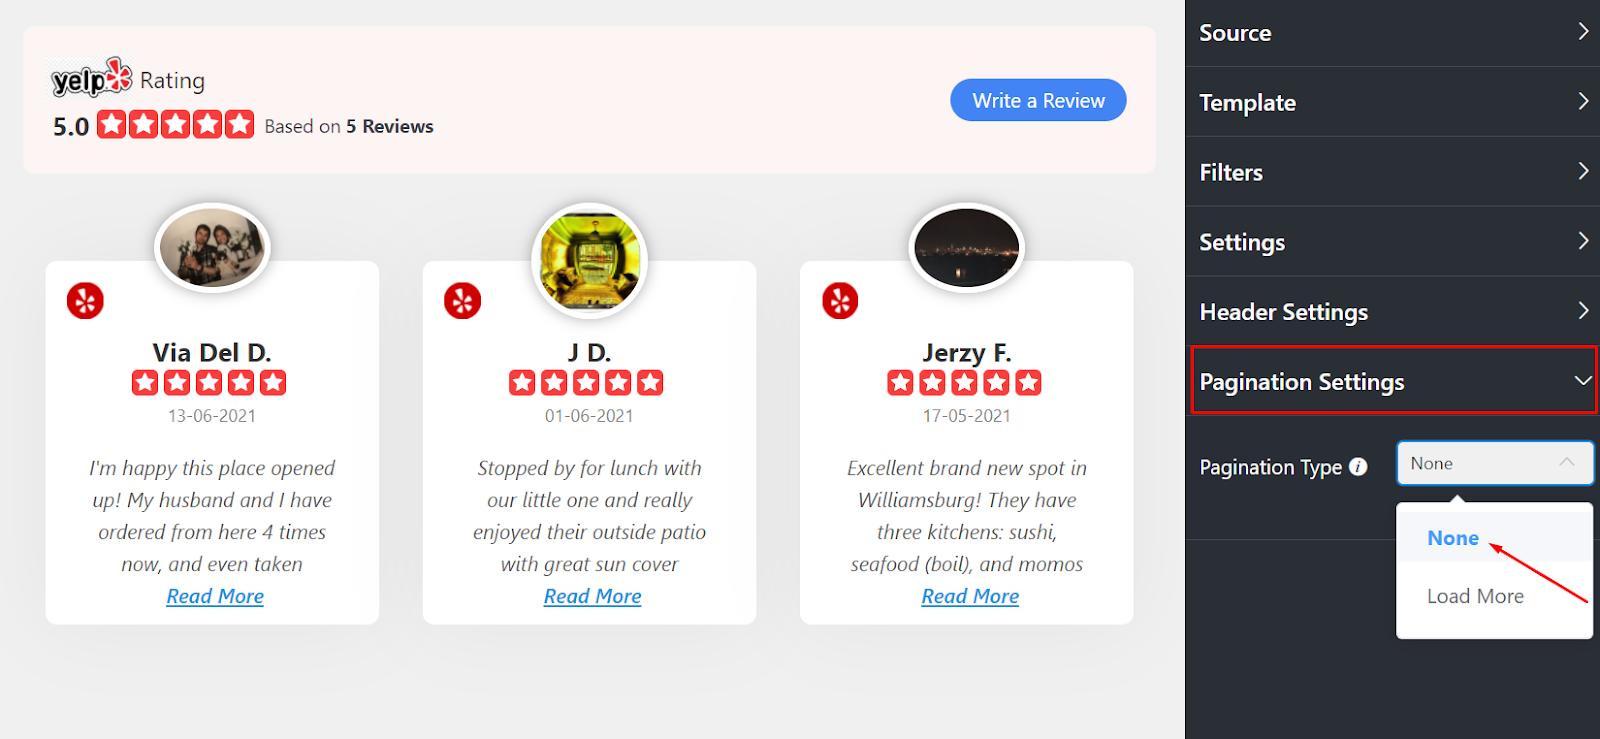 Yelp reviews Pagination Settings